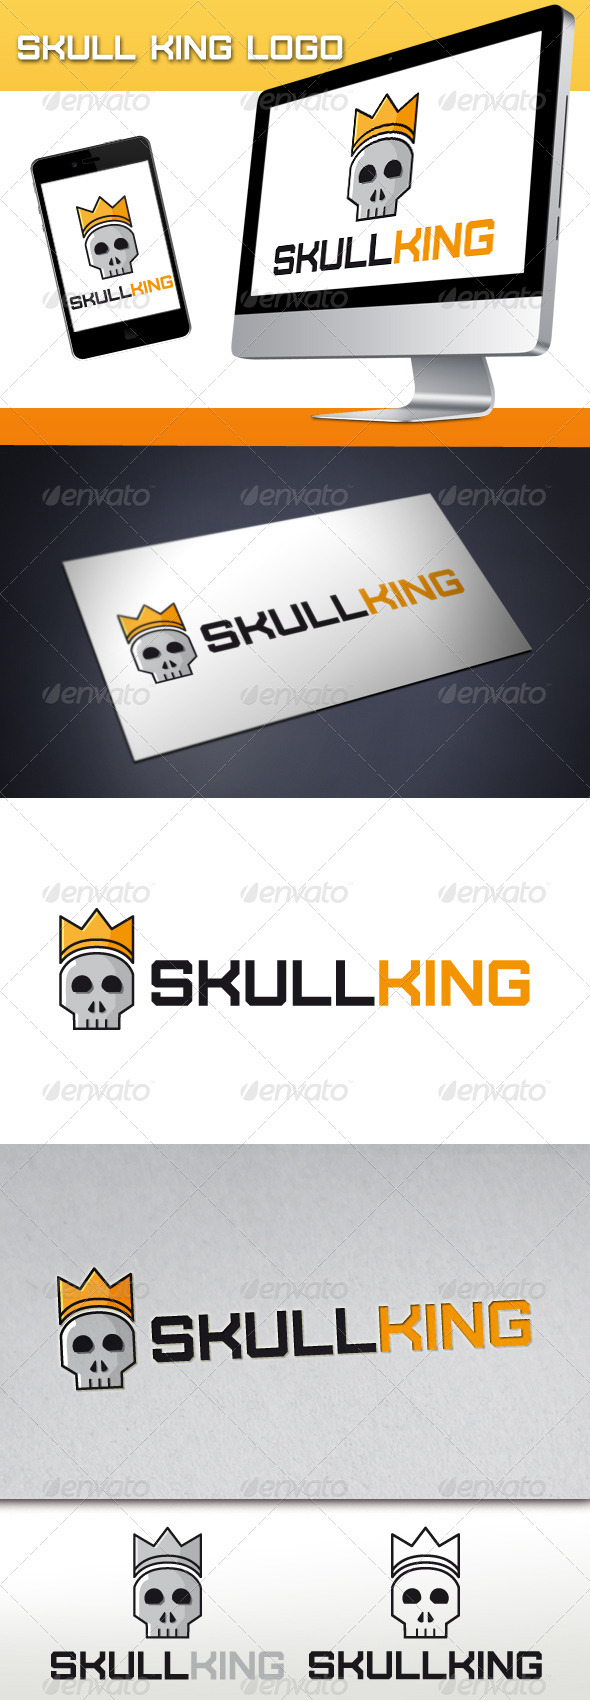 GraphicRiver Skull King Logo 3376950